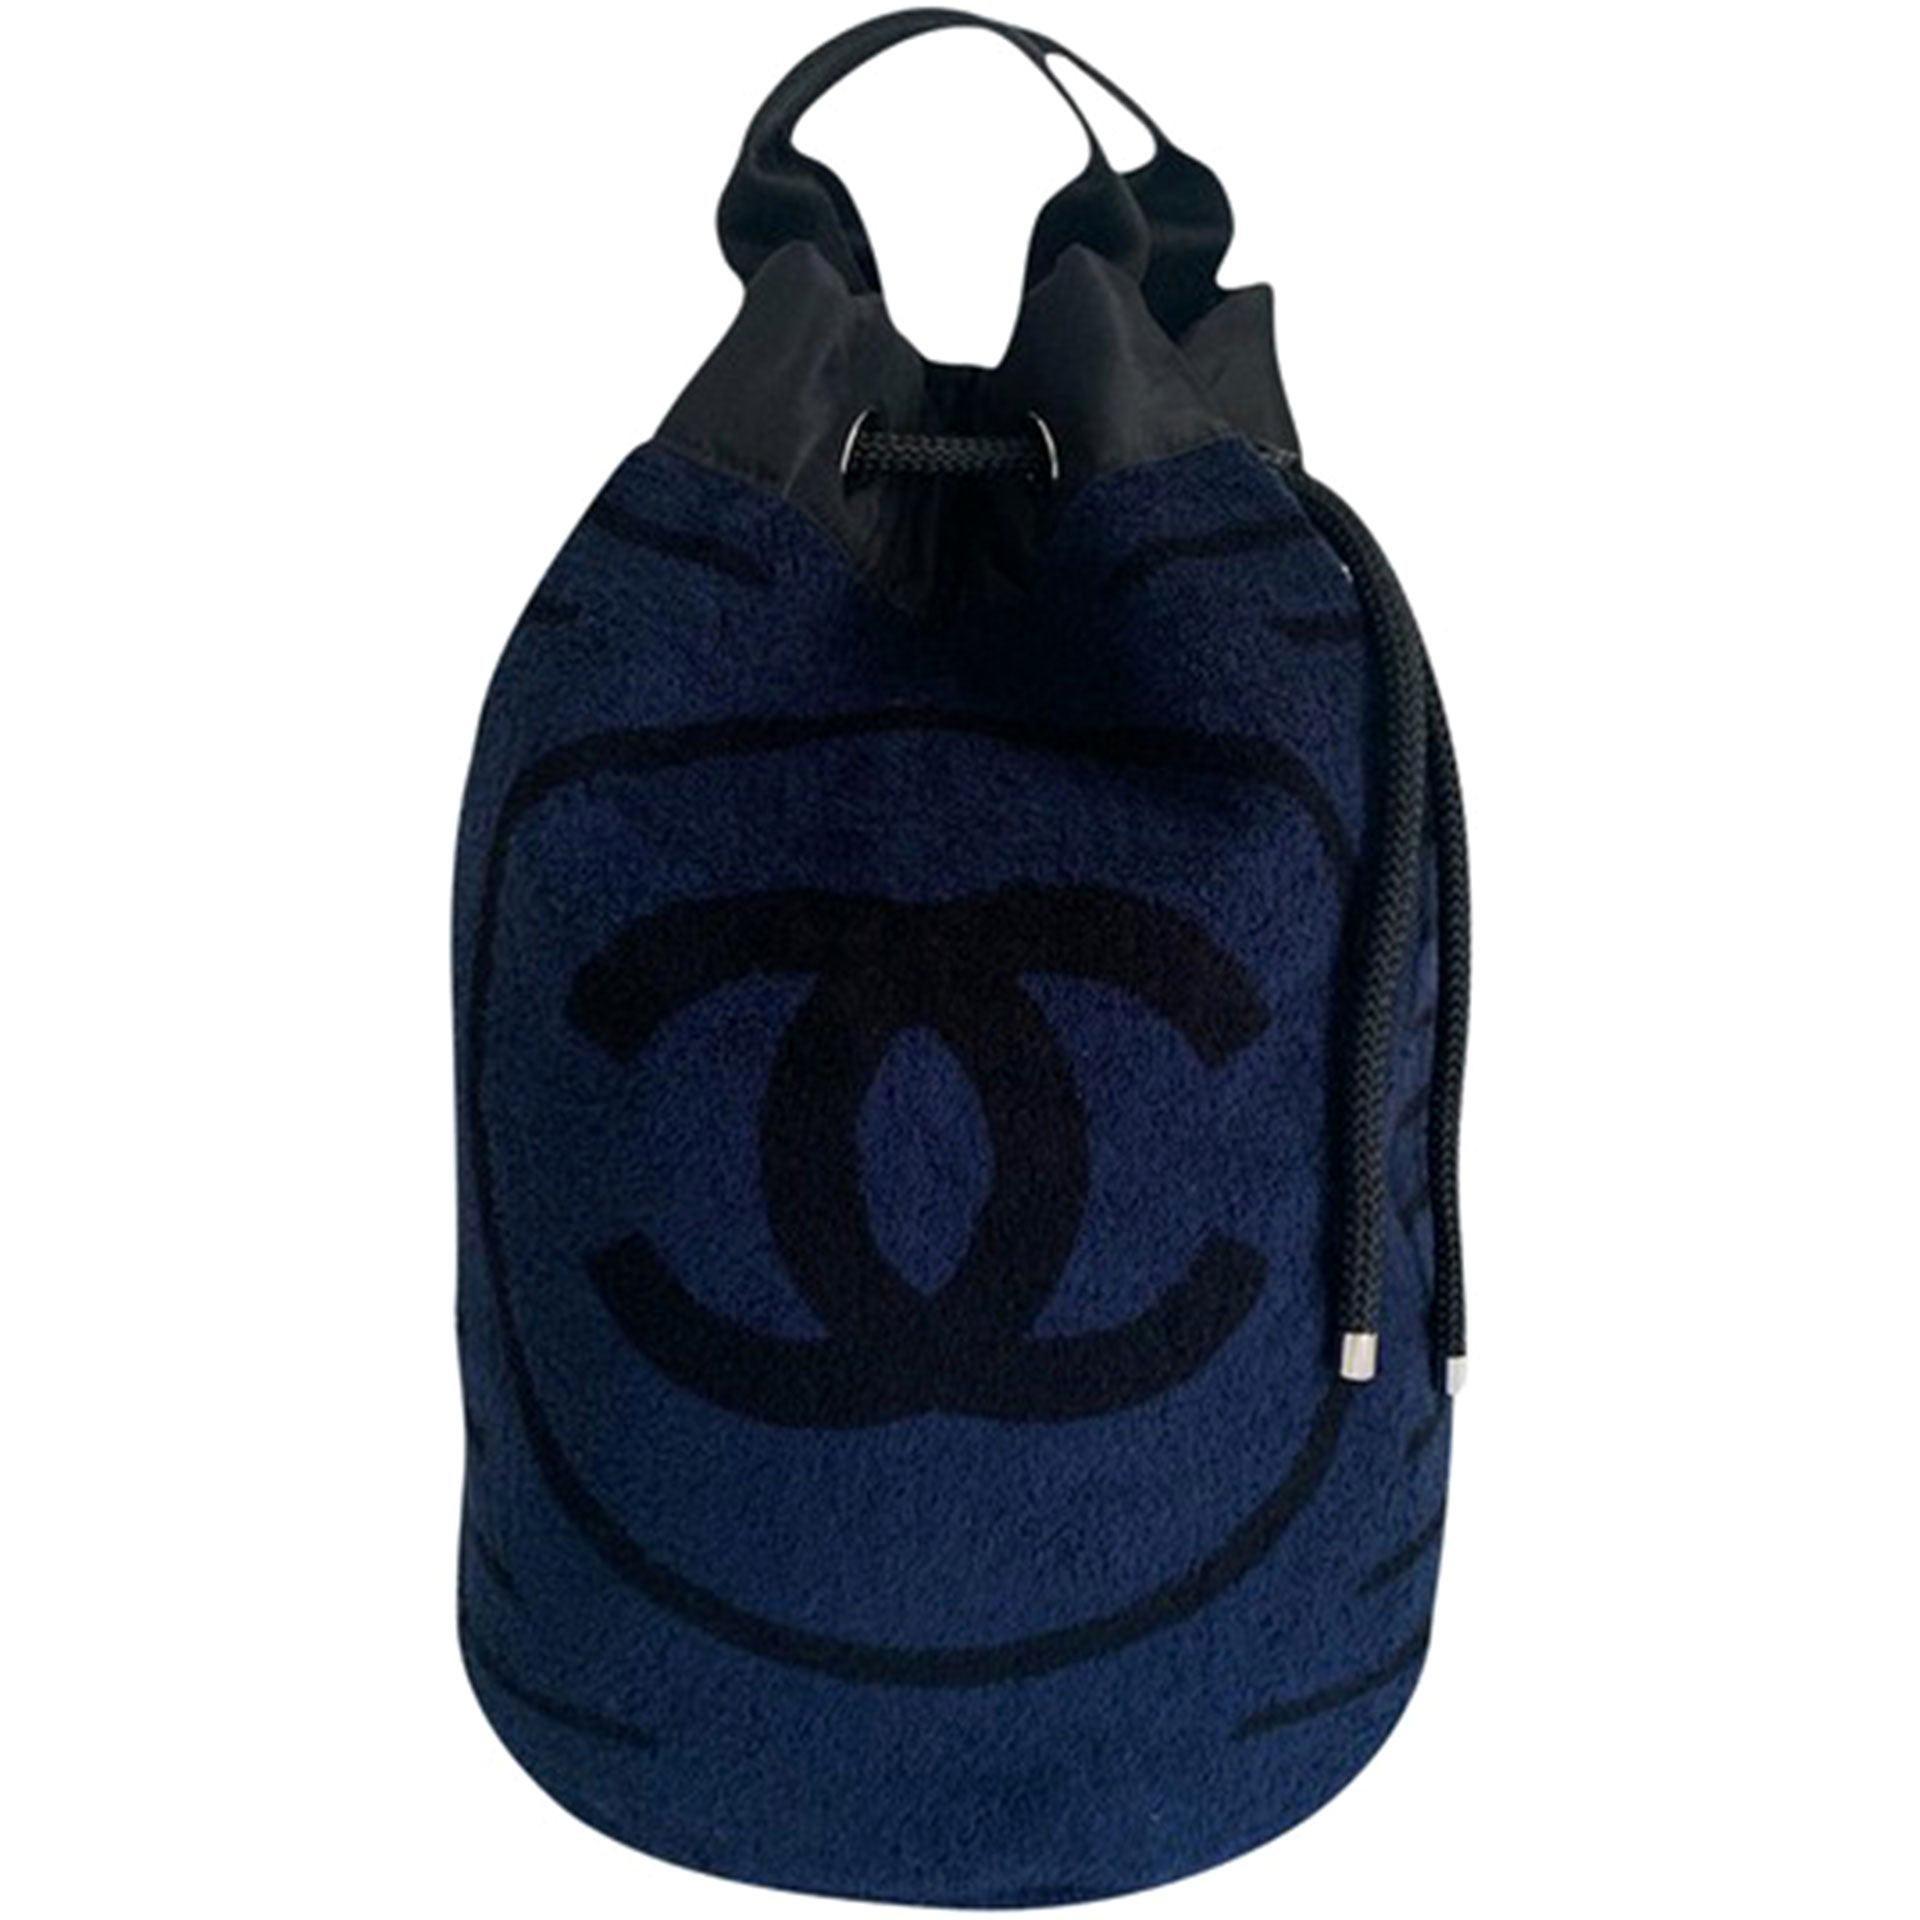 Chanel Dark Dark Navy Blue Striped CC Logo Drawstring Large Beach Tote Bag